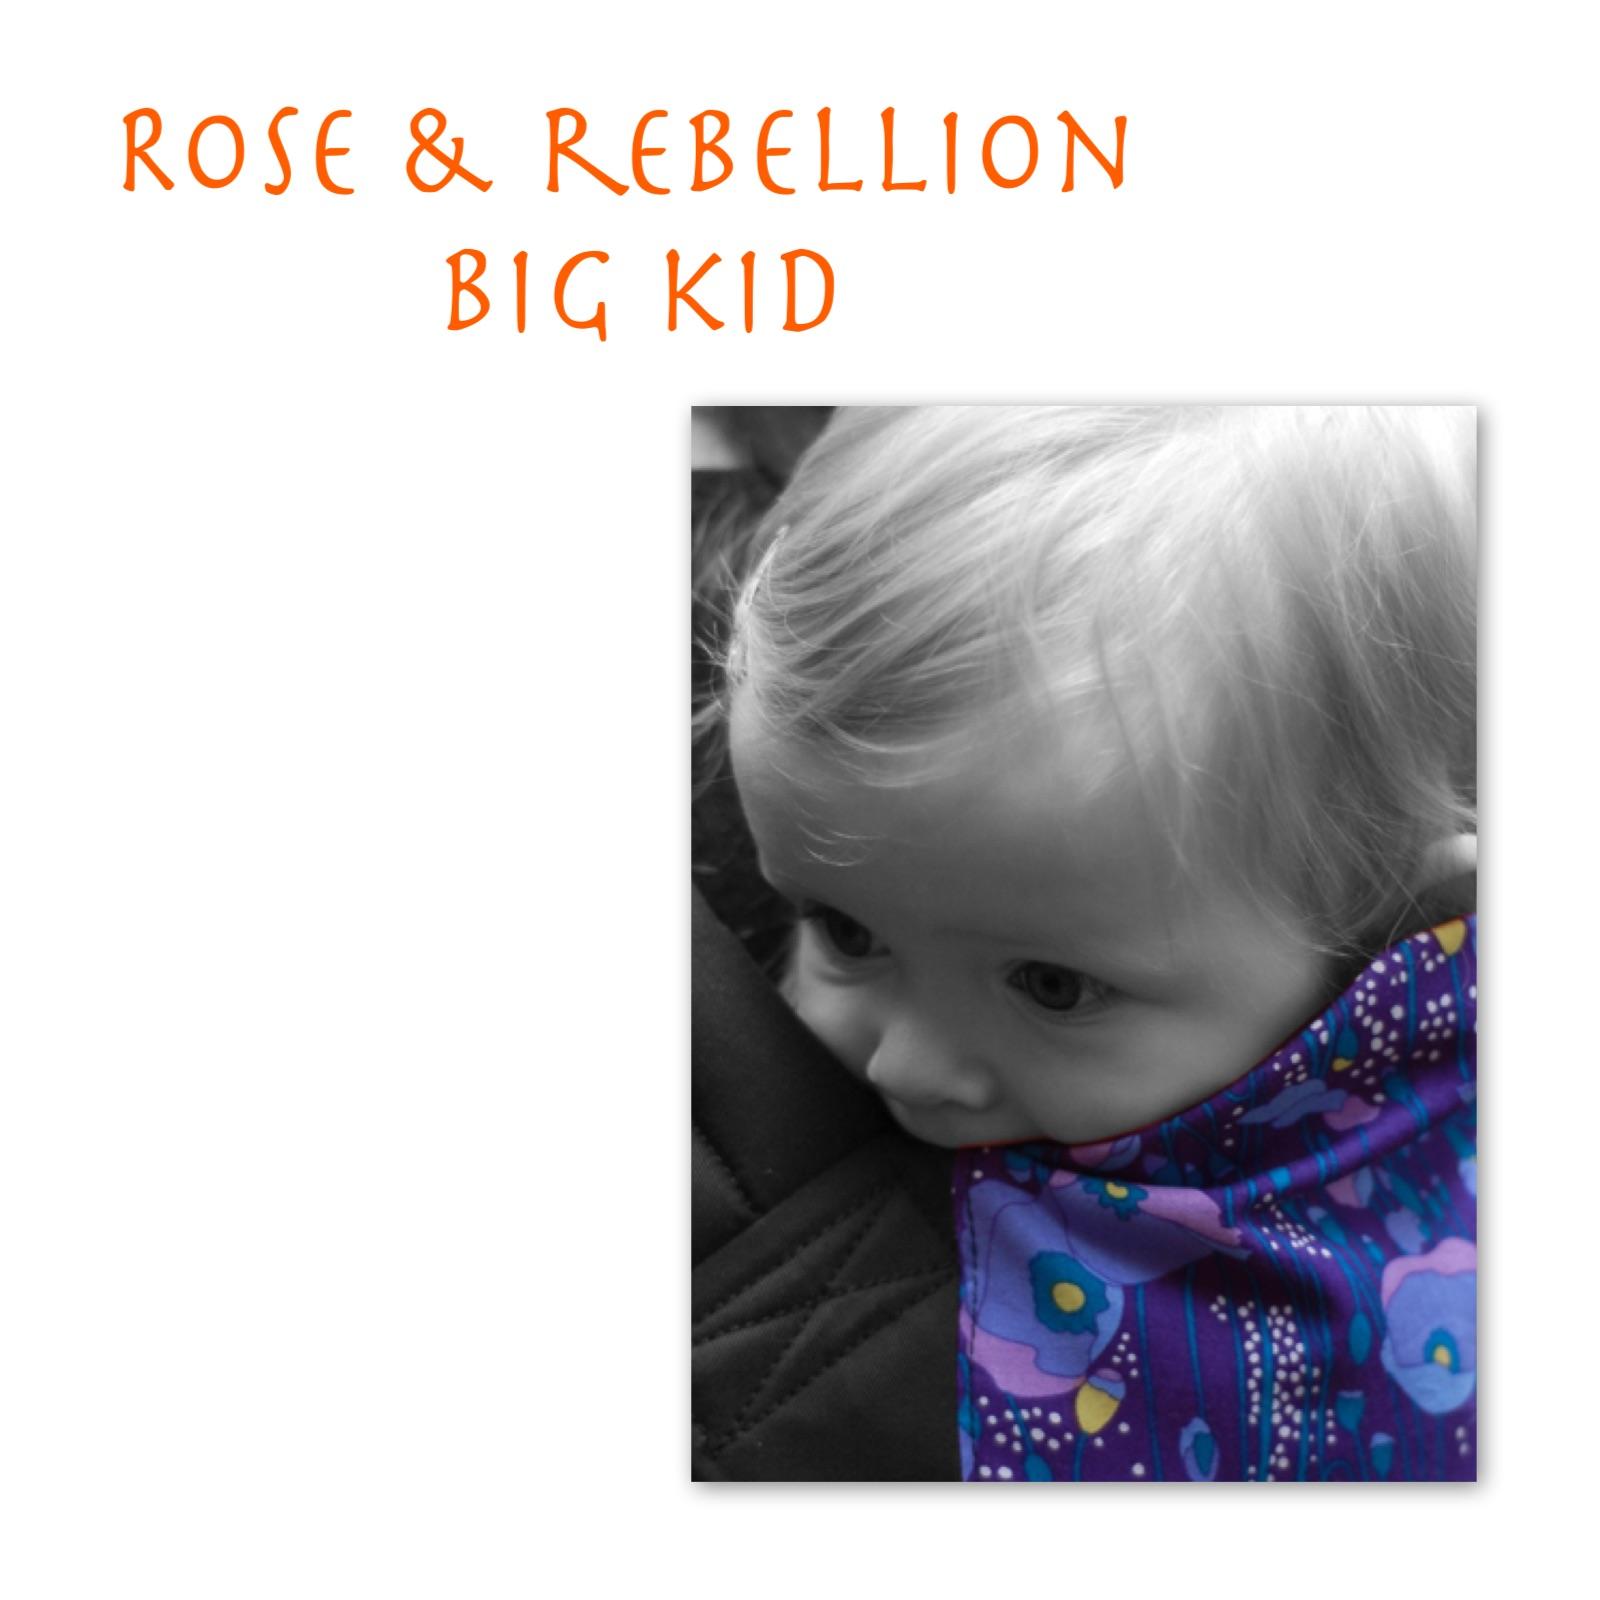 Rose & Rebellion Big Kid